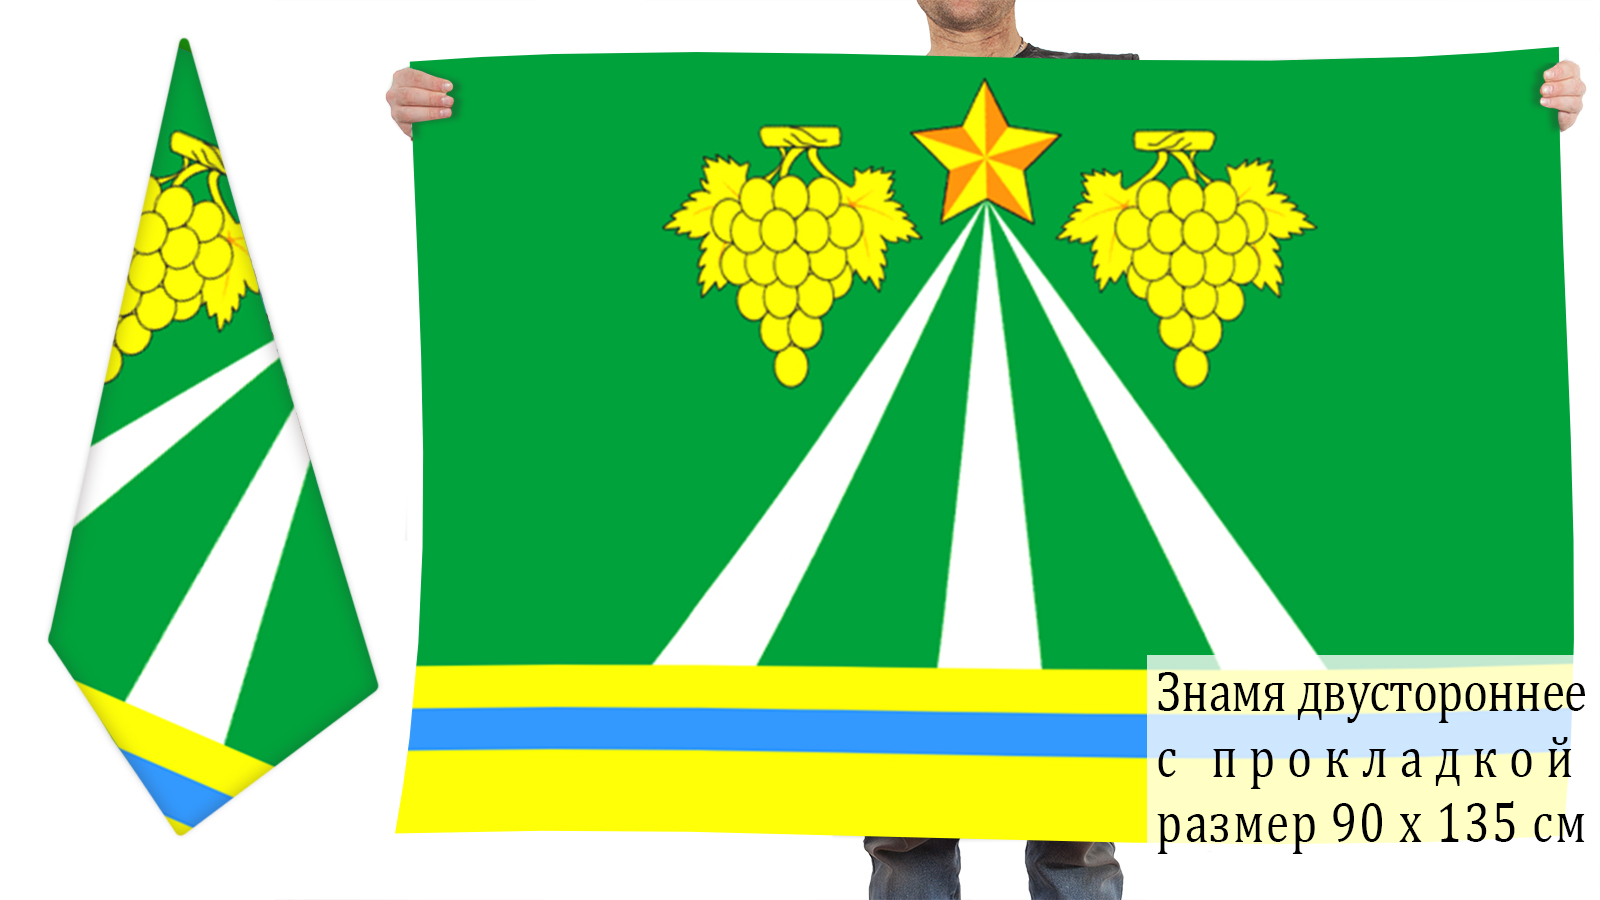 Двусторонний флаг Крымского района